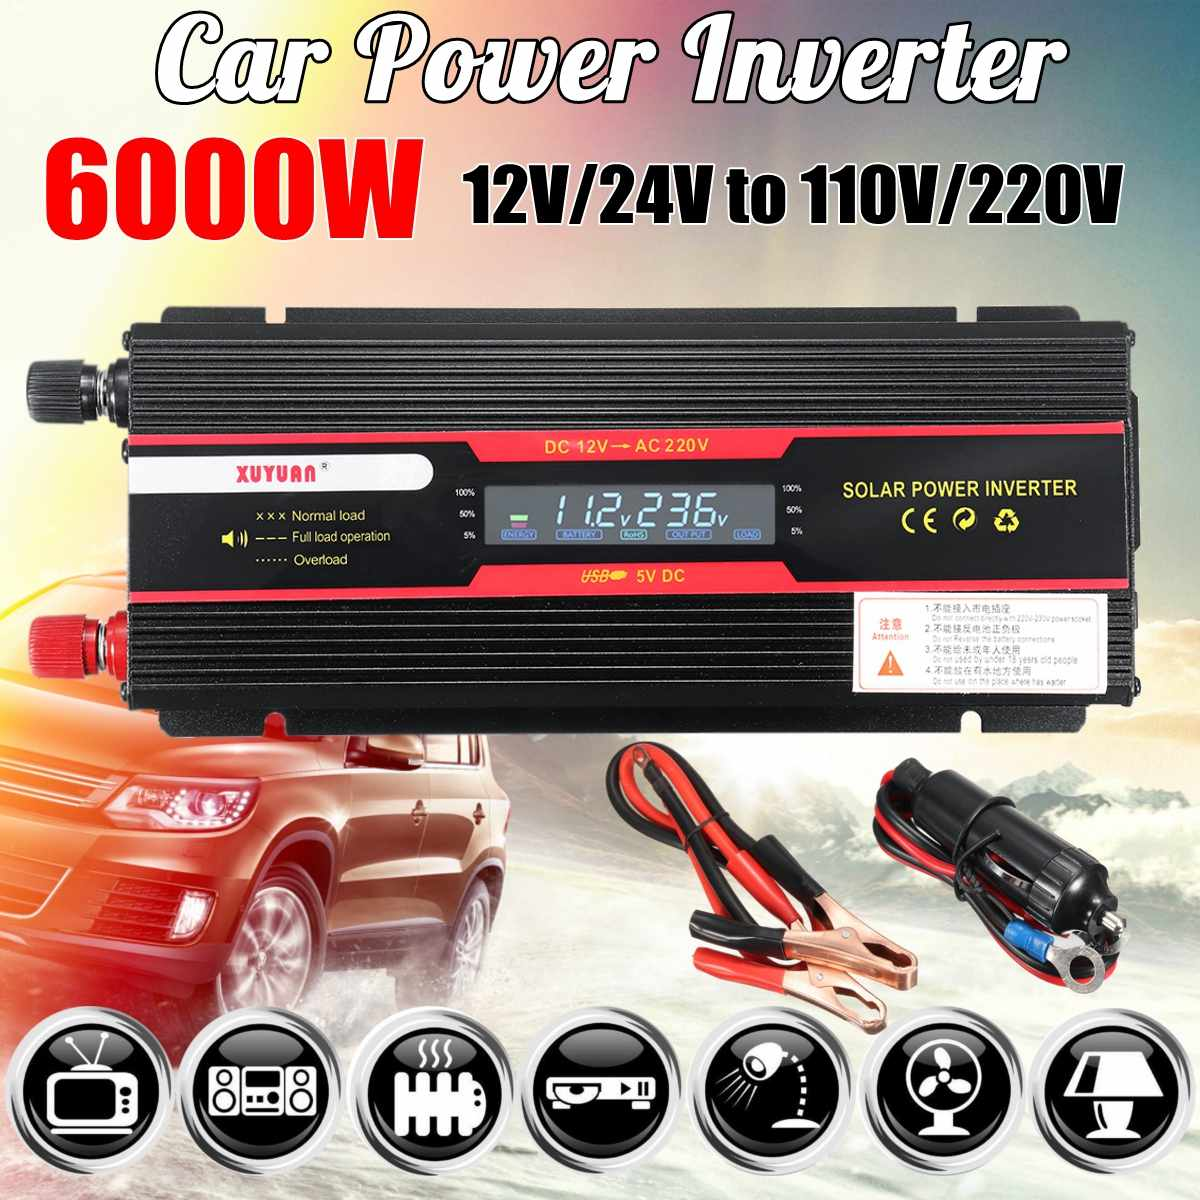 Car Inverter 12V 220V 5000W/6000W P eak Power Inverter Voltage Convertor Transformer 12V/24V To 110V/220V Inversor + LCD DisplayCar Inverter 12V 220V 5000W/6000W P eak Power Inverter Voltage Convertor Transformer 12V/24V To 110V/220V Inversor + LCD Display